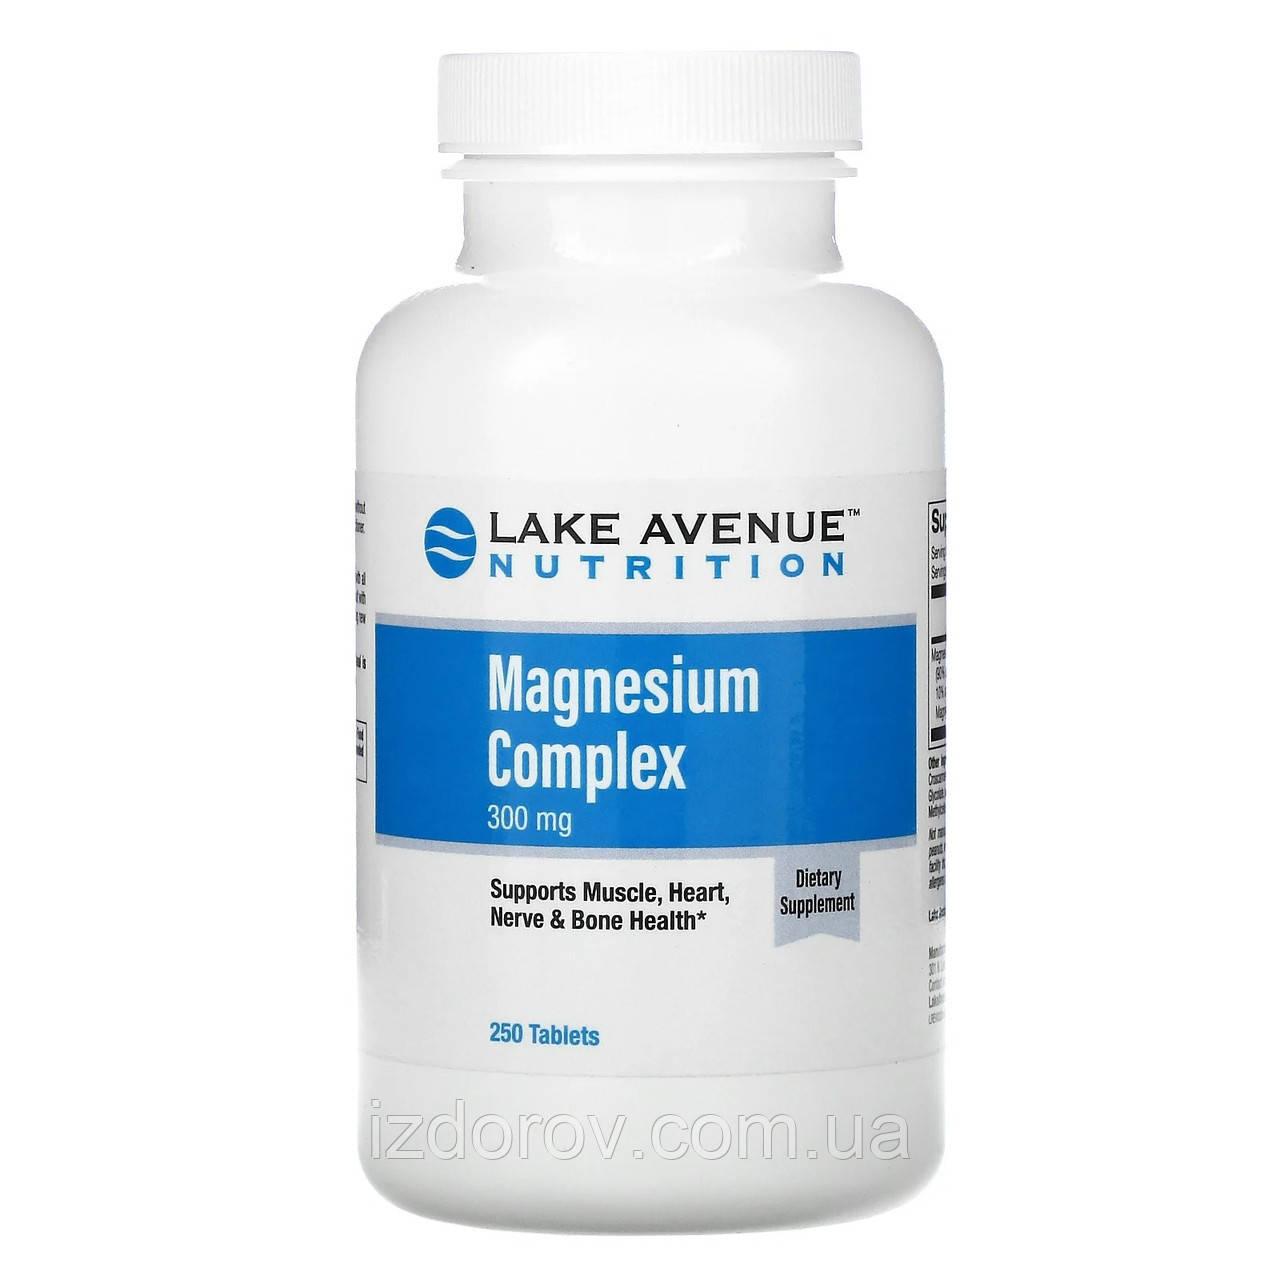 Lake Avenue Nutrition, Комплекс магнію, 300 мг, Magnesium Complex, 250 таблеток